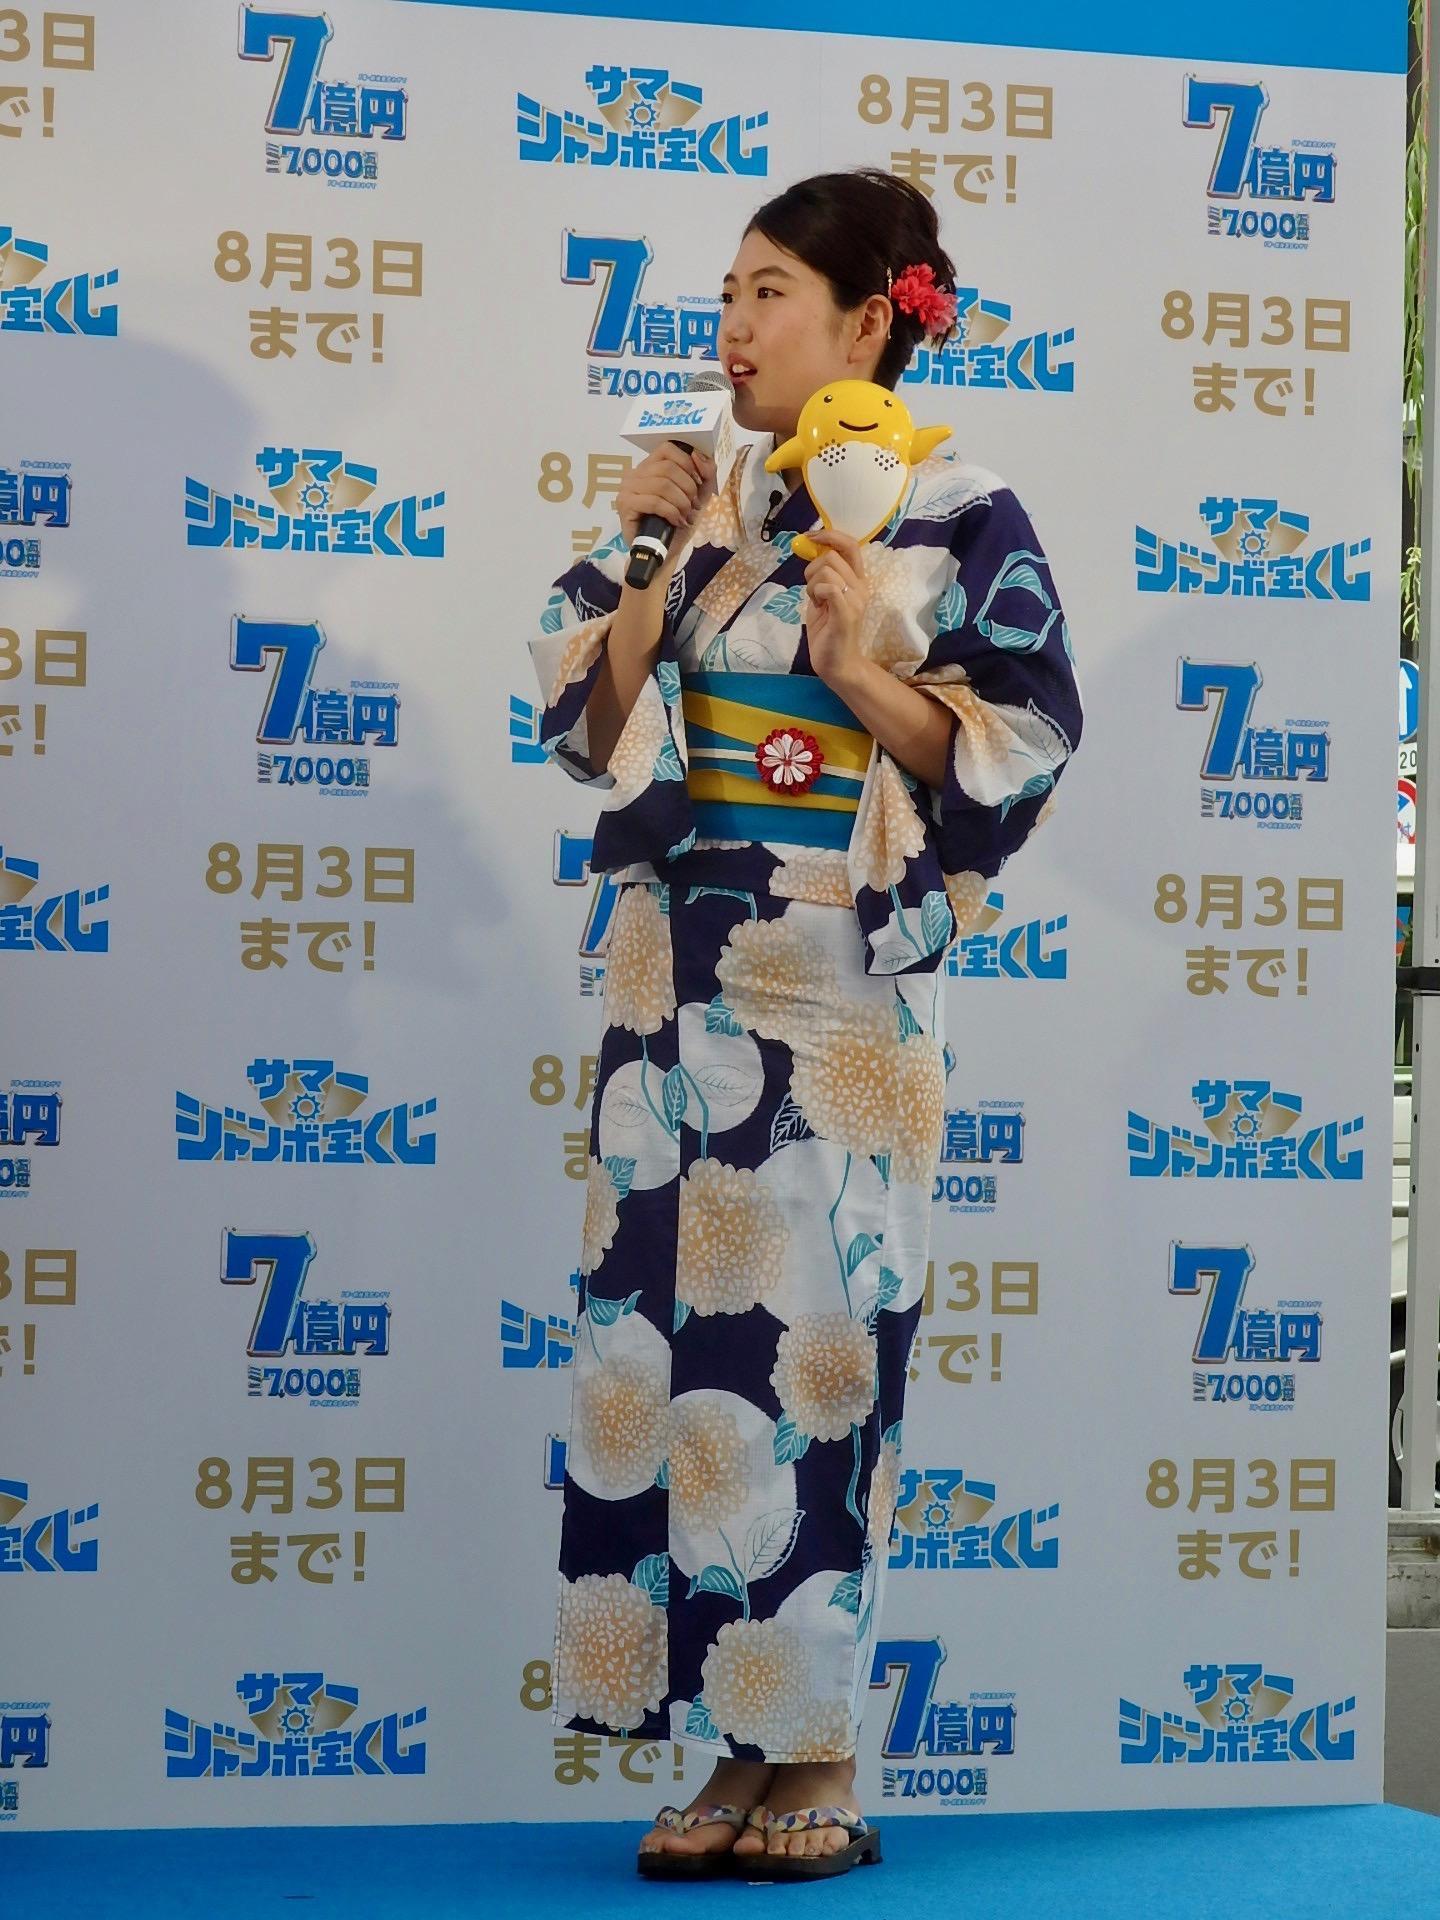 http://news.yoshimoto.co.jp/20180709203032-203f963e0d88cb3bd64b380d1685ee43df3bd897.jpg